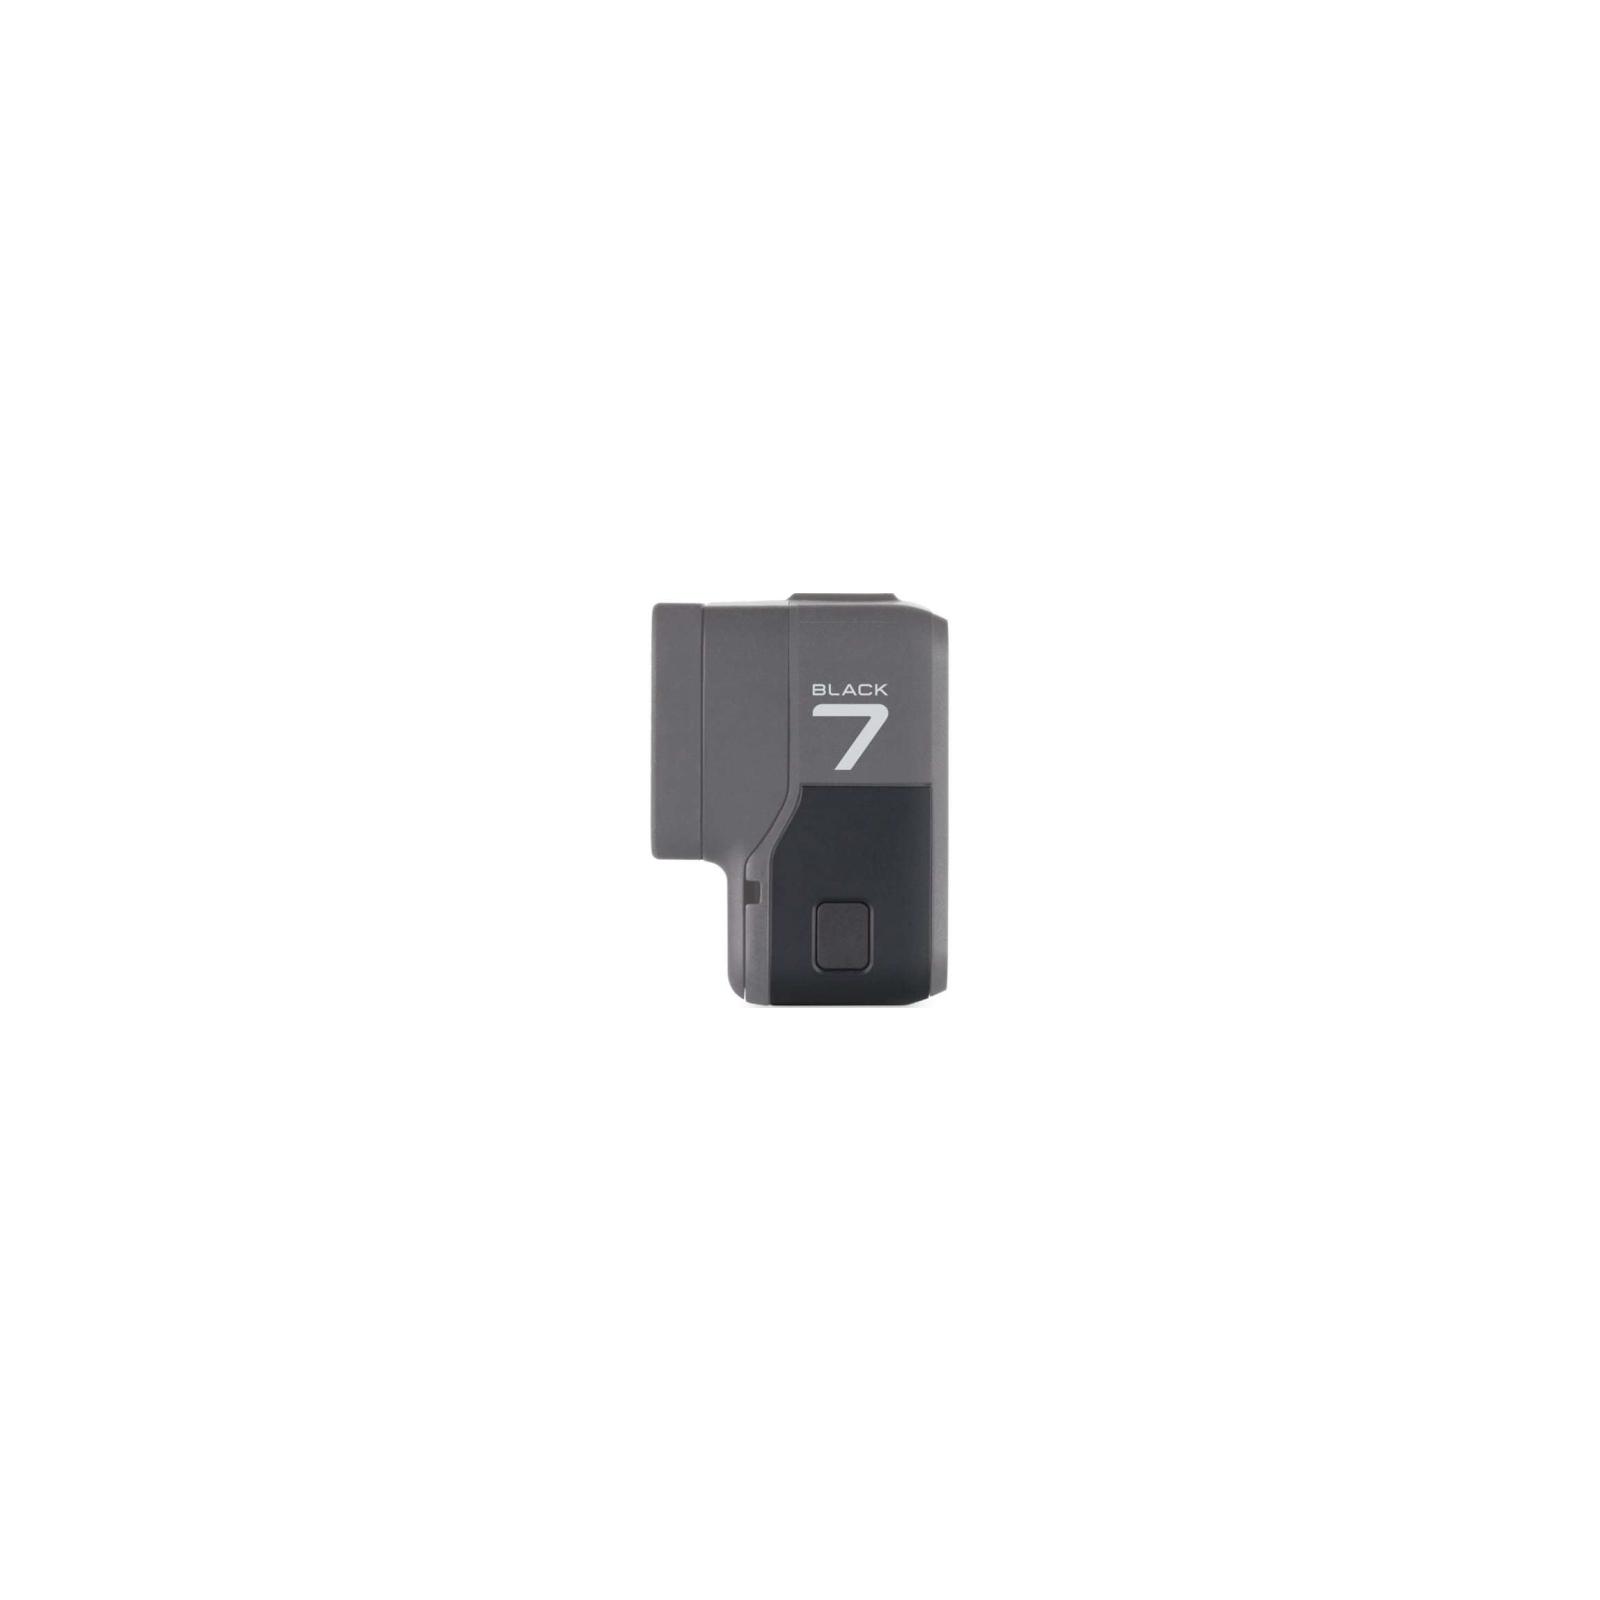 Аксессуар к экшн-камерам GoPro Replacement Door HERO7 Black (AAIOD-003) изображение 2